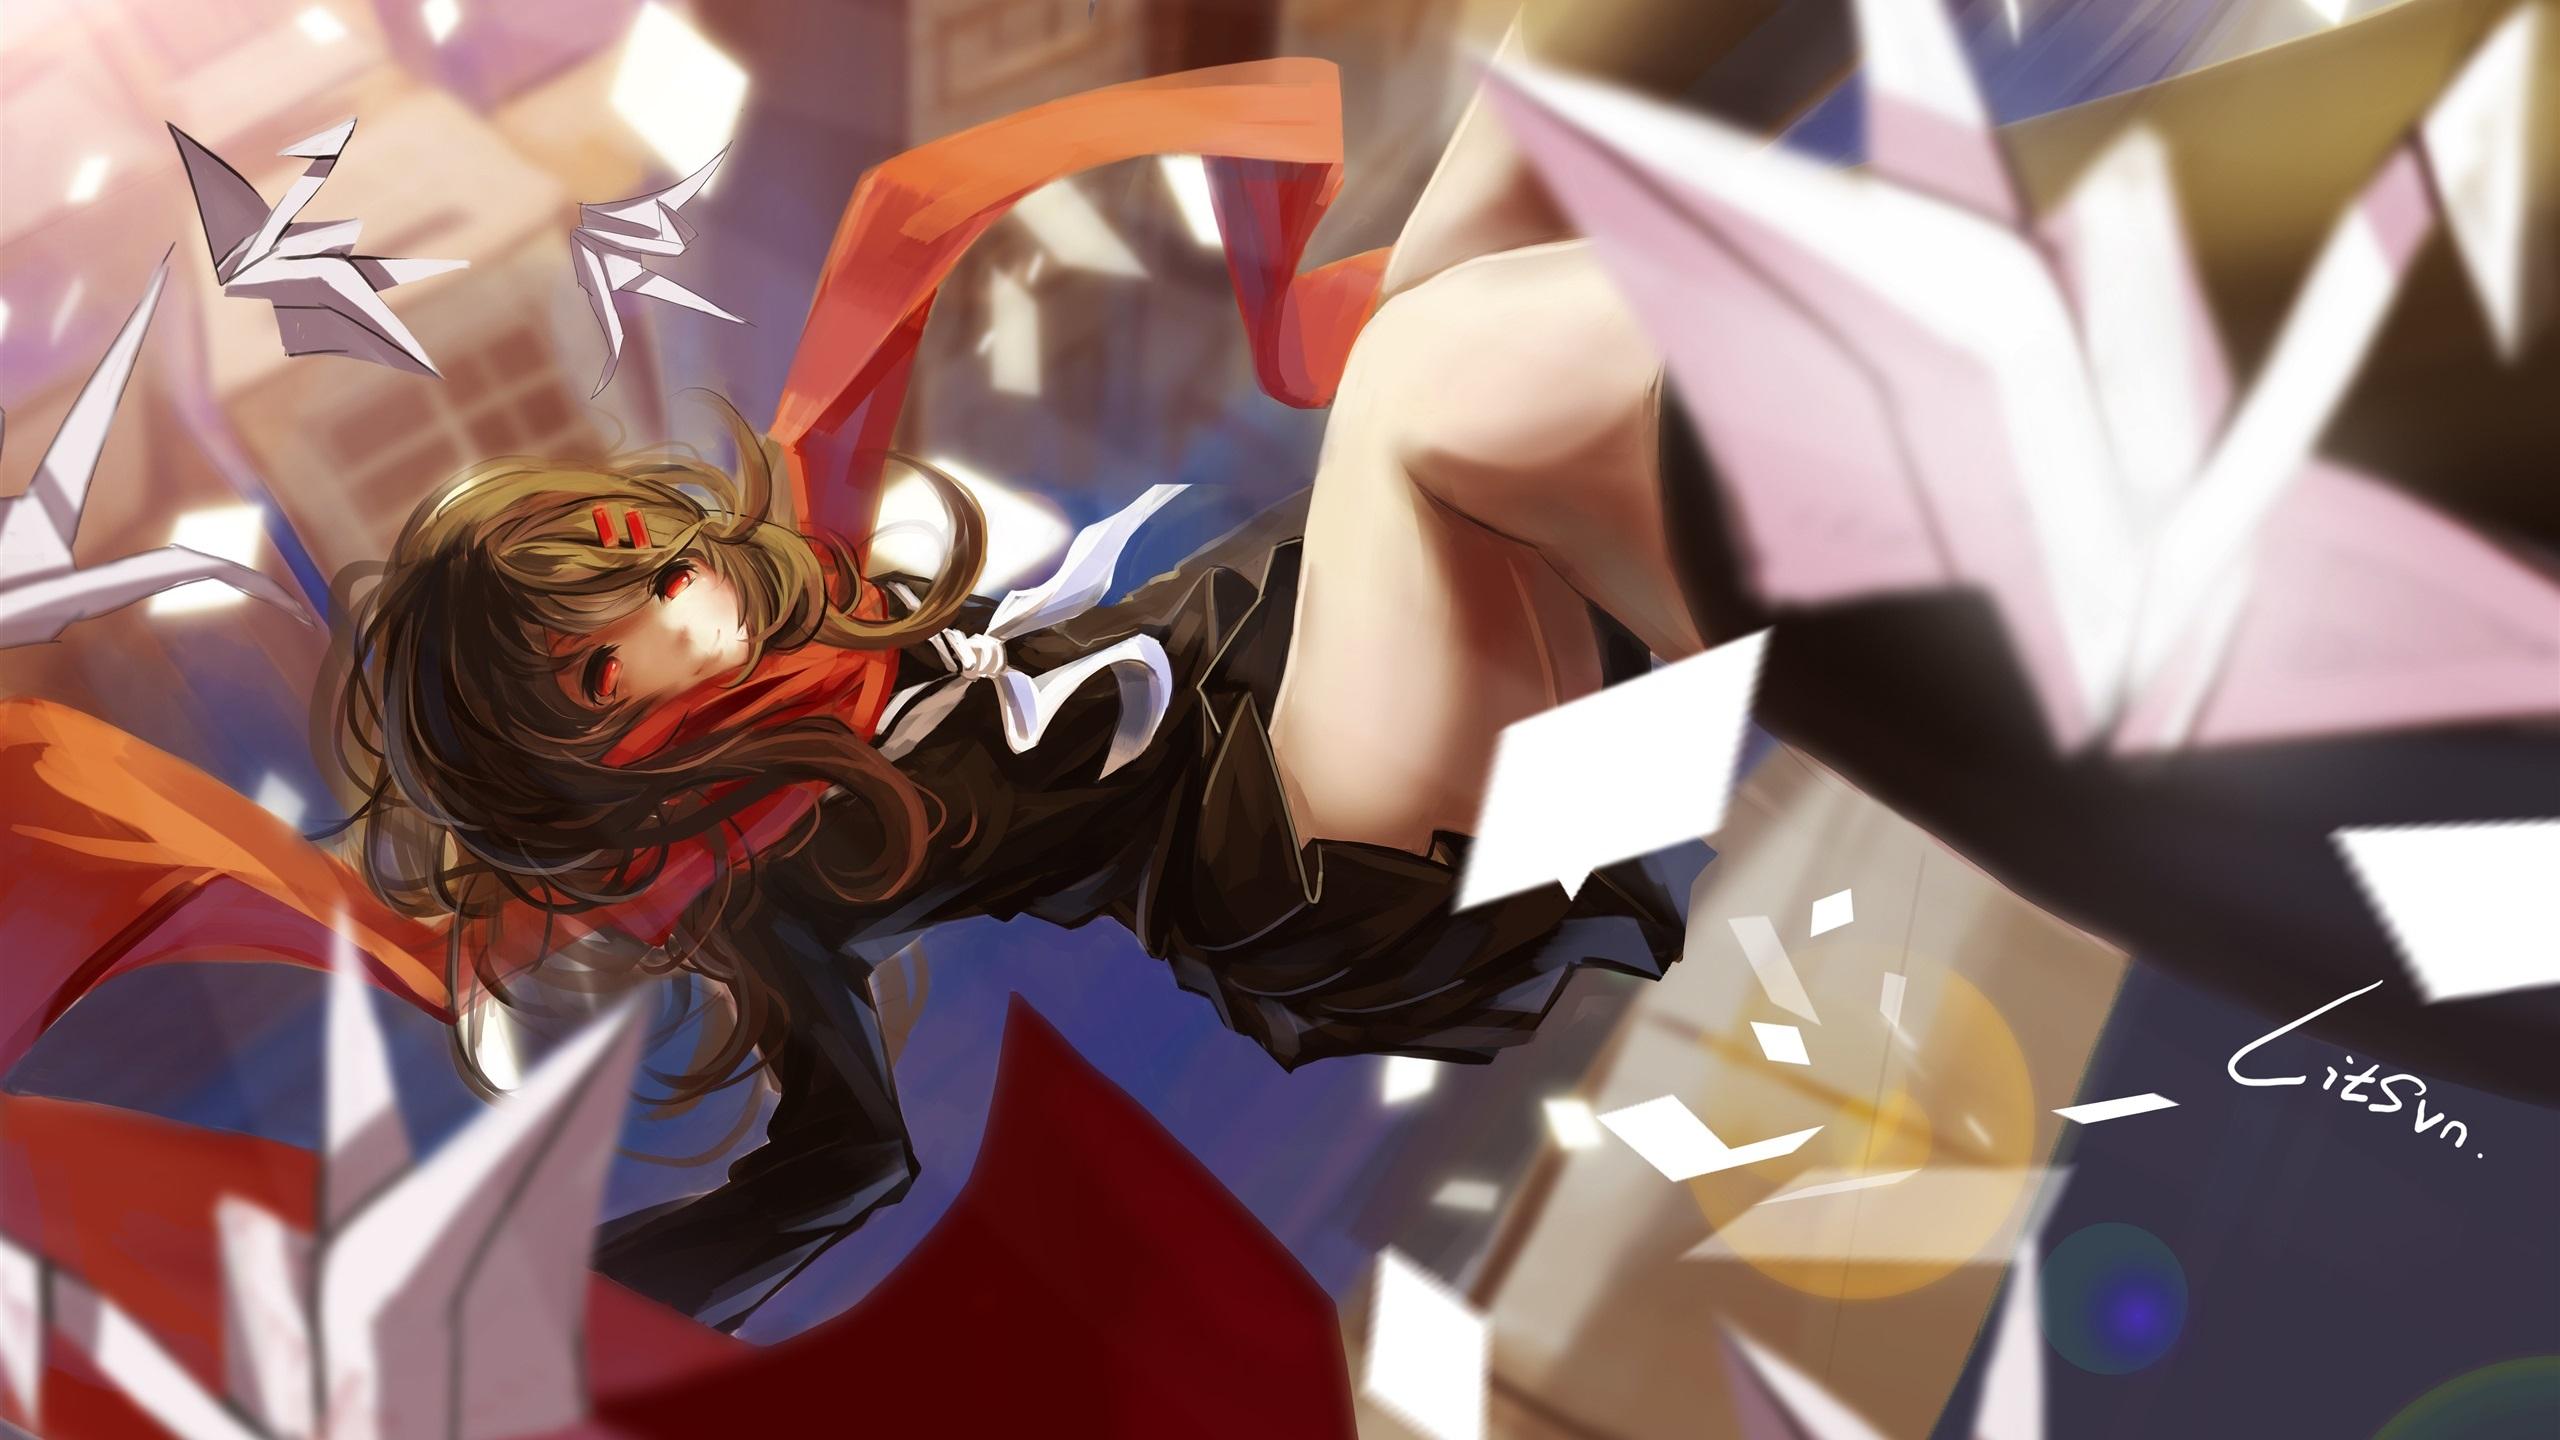 Wallpaper Anime girl flight, scarf, city, origami 8x8 HD